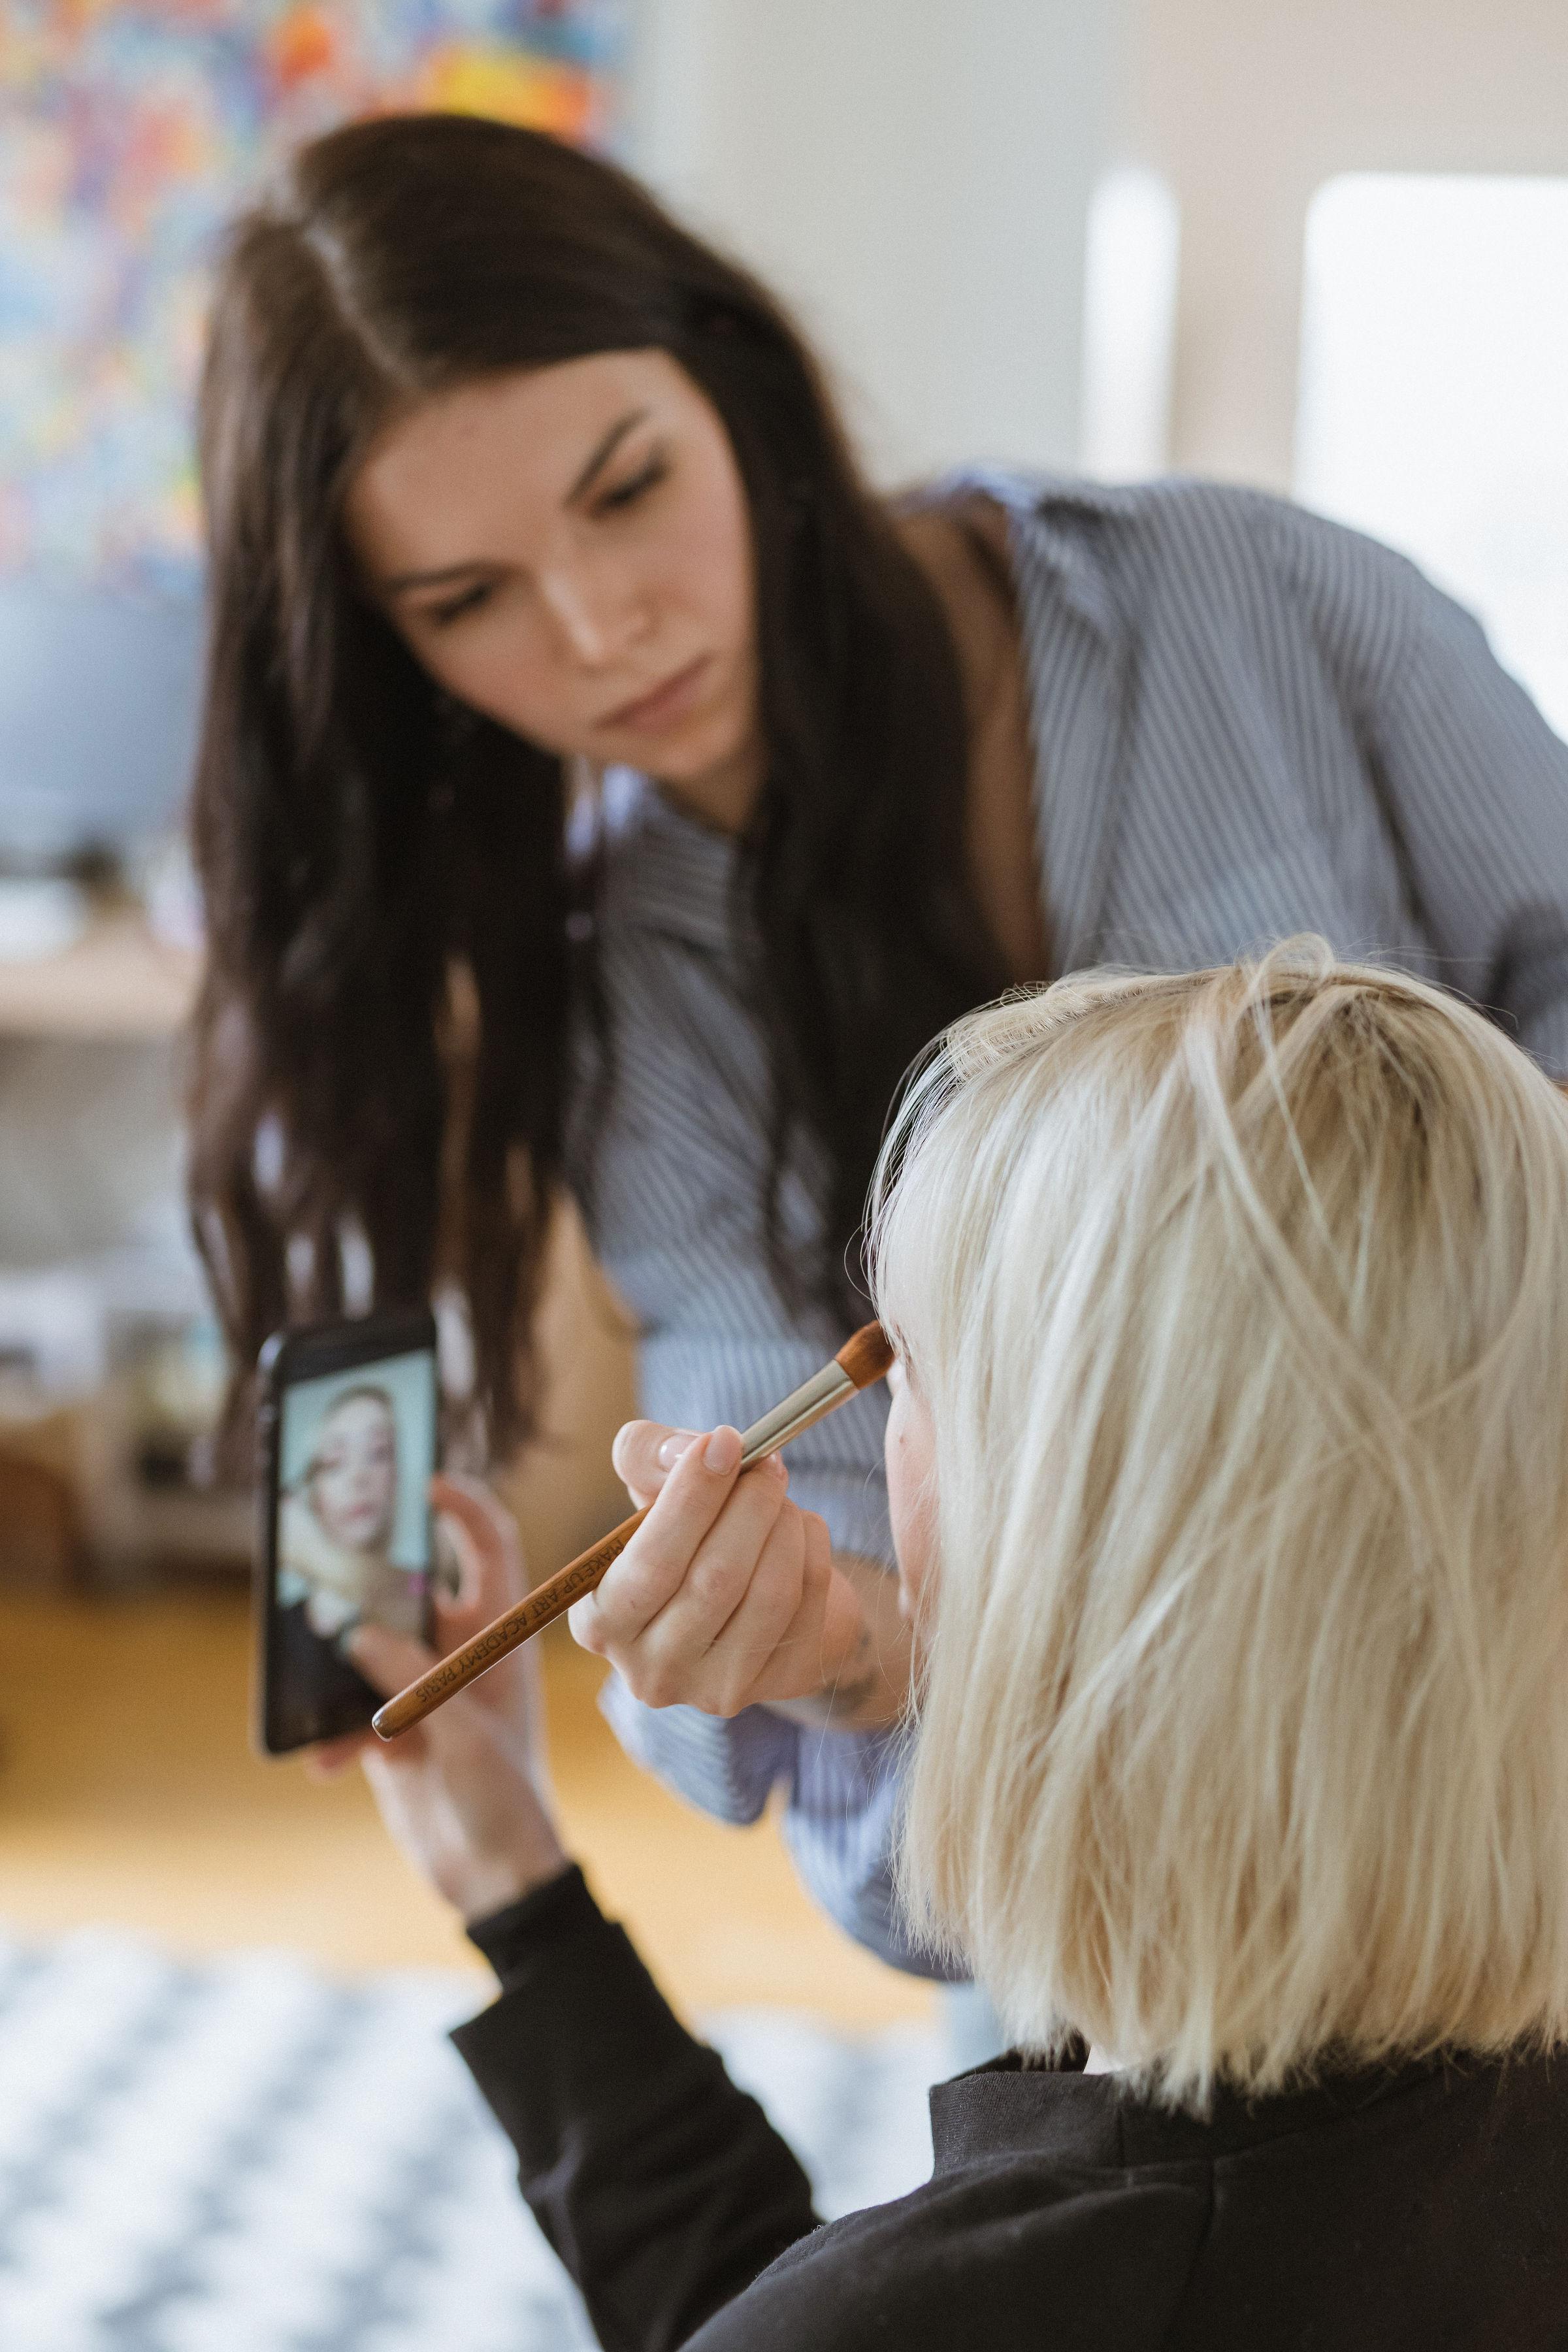 Sasha Lebeid MakeUp Artist in Paris by iheartparisfr.jpg